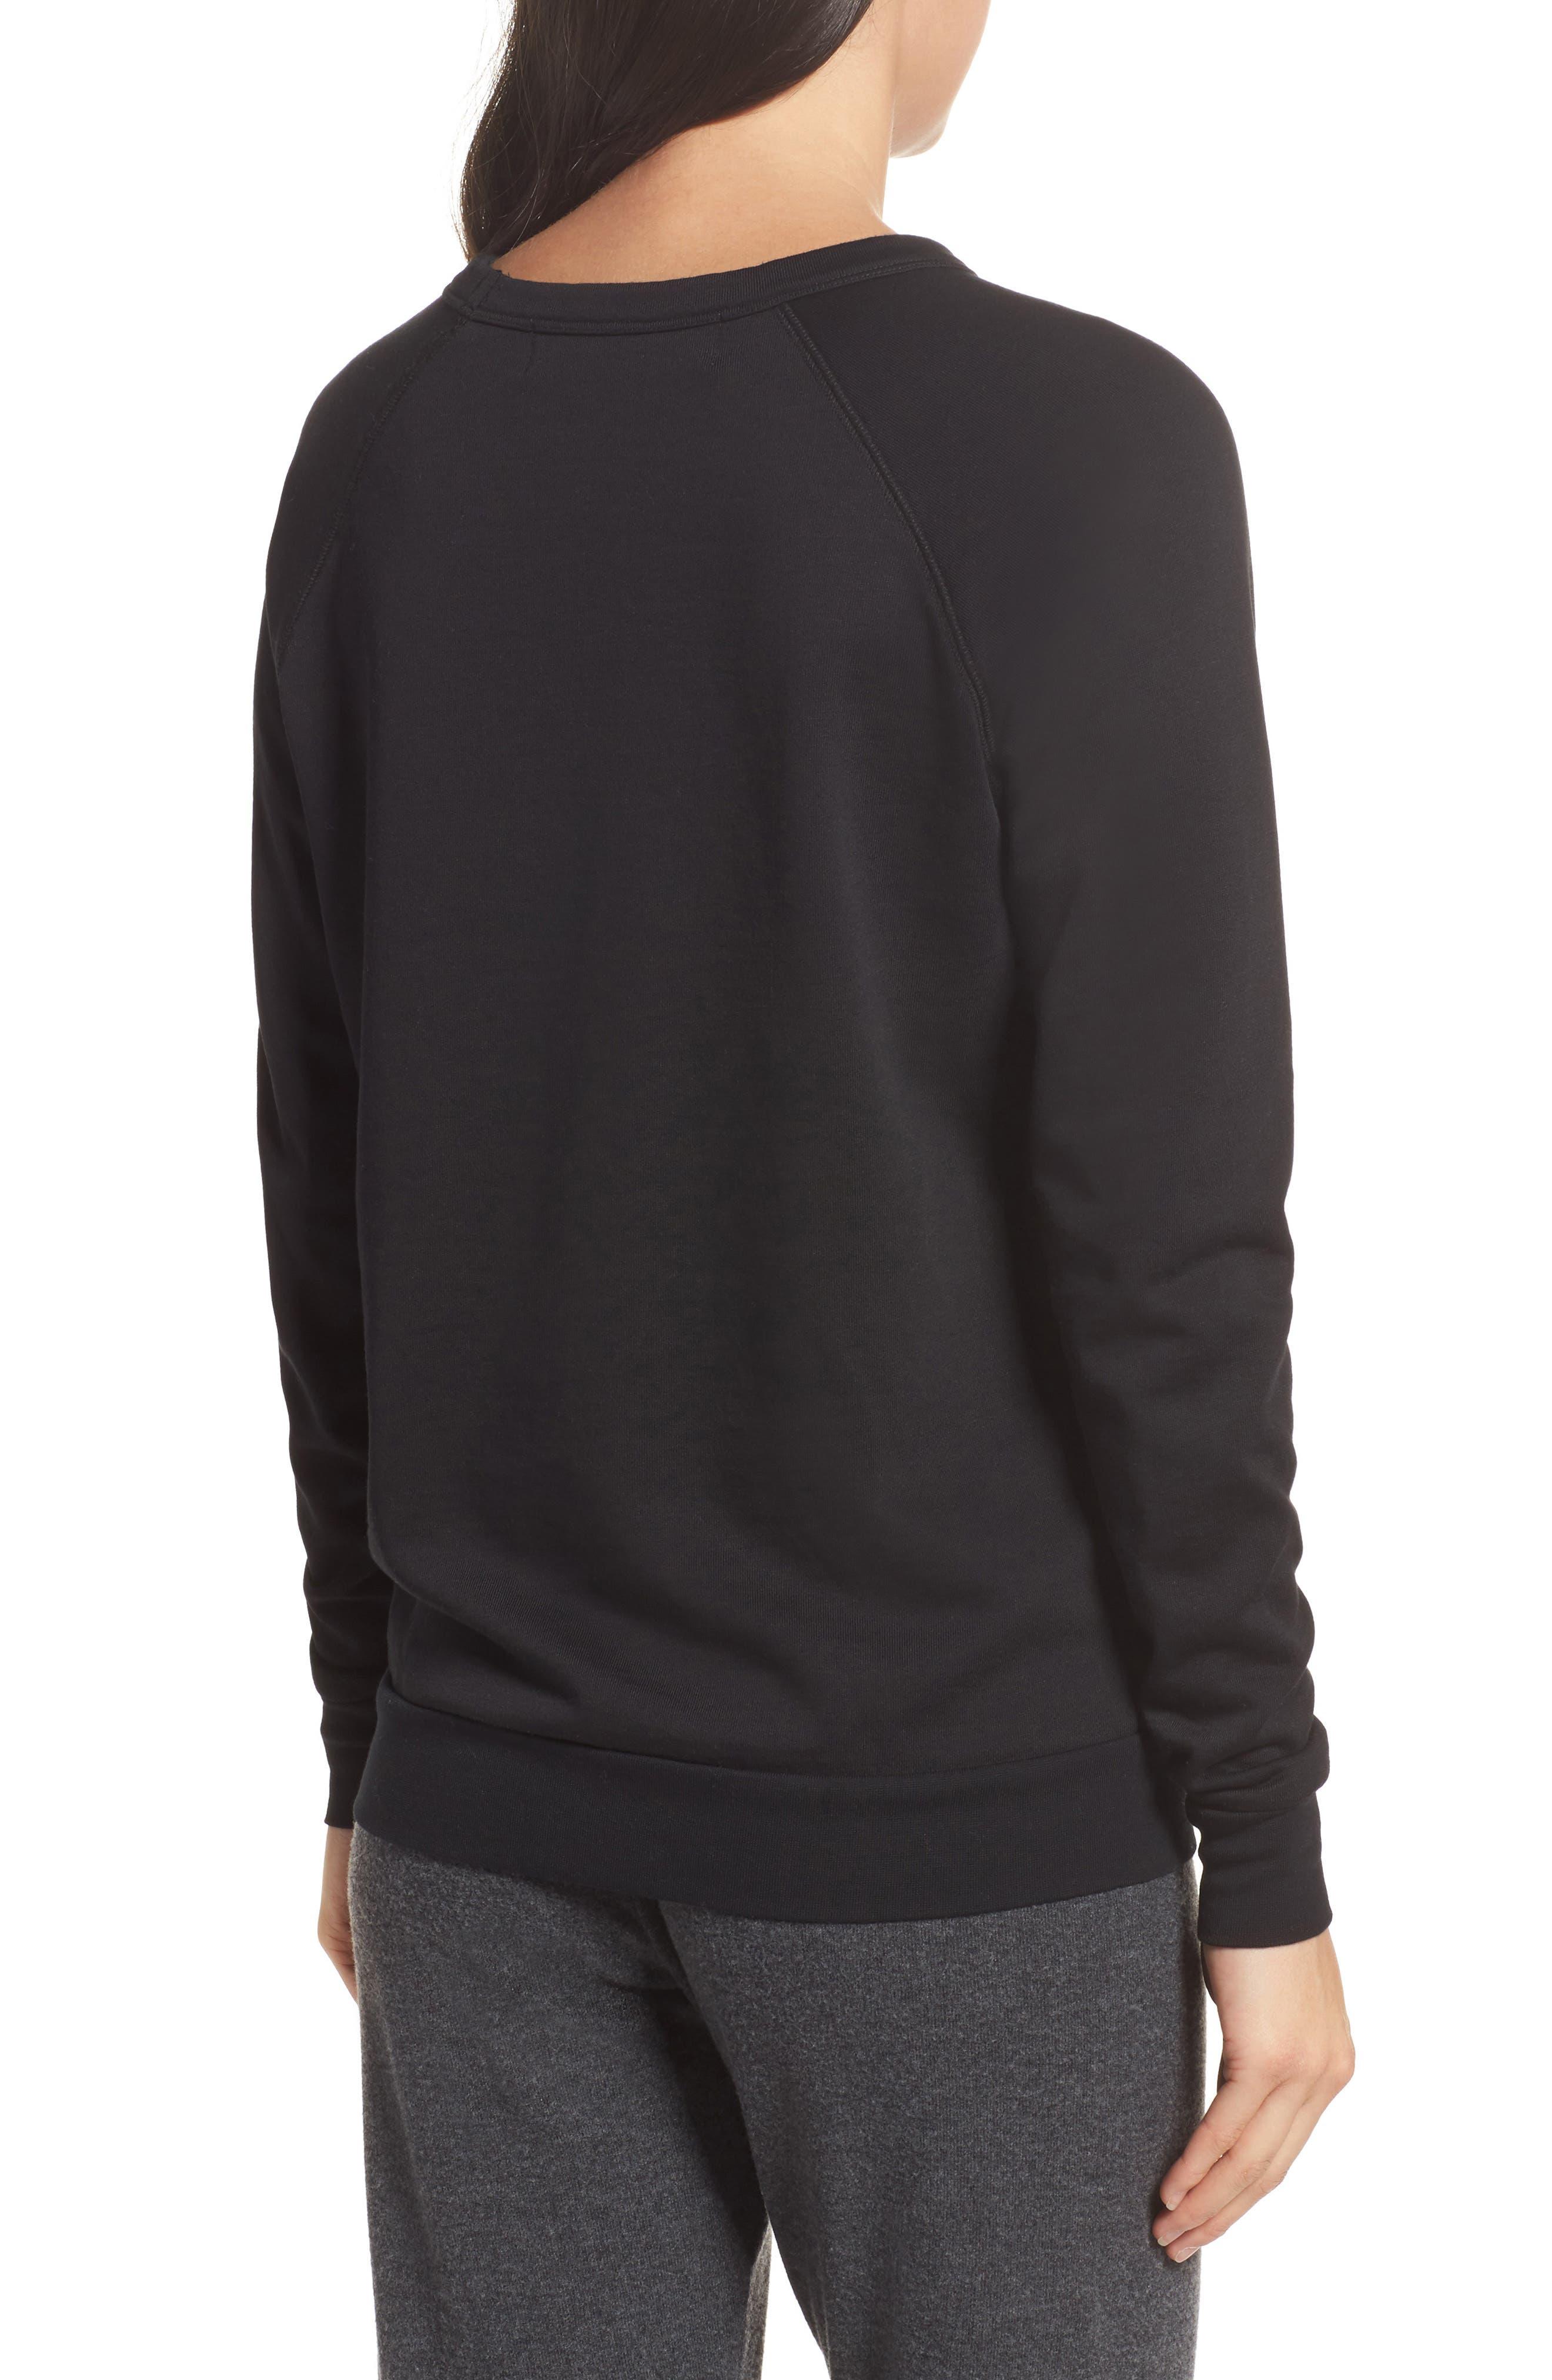 Pray For Wine Sweatshirt,                             Alternate thumbnail 2, color,                             Black